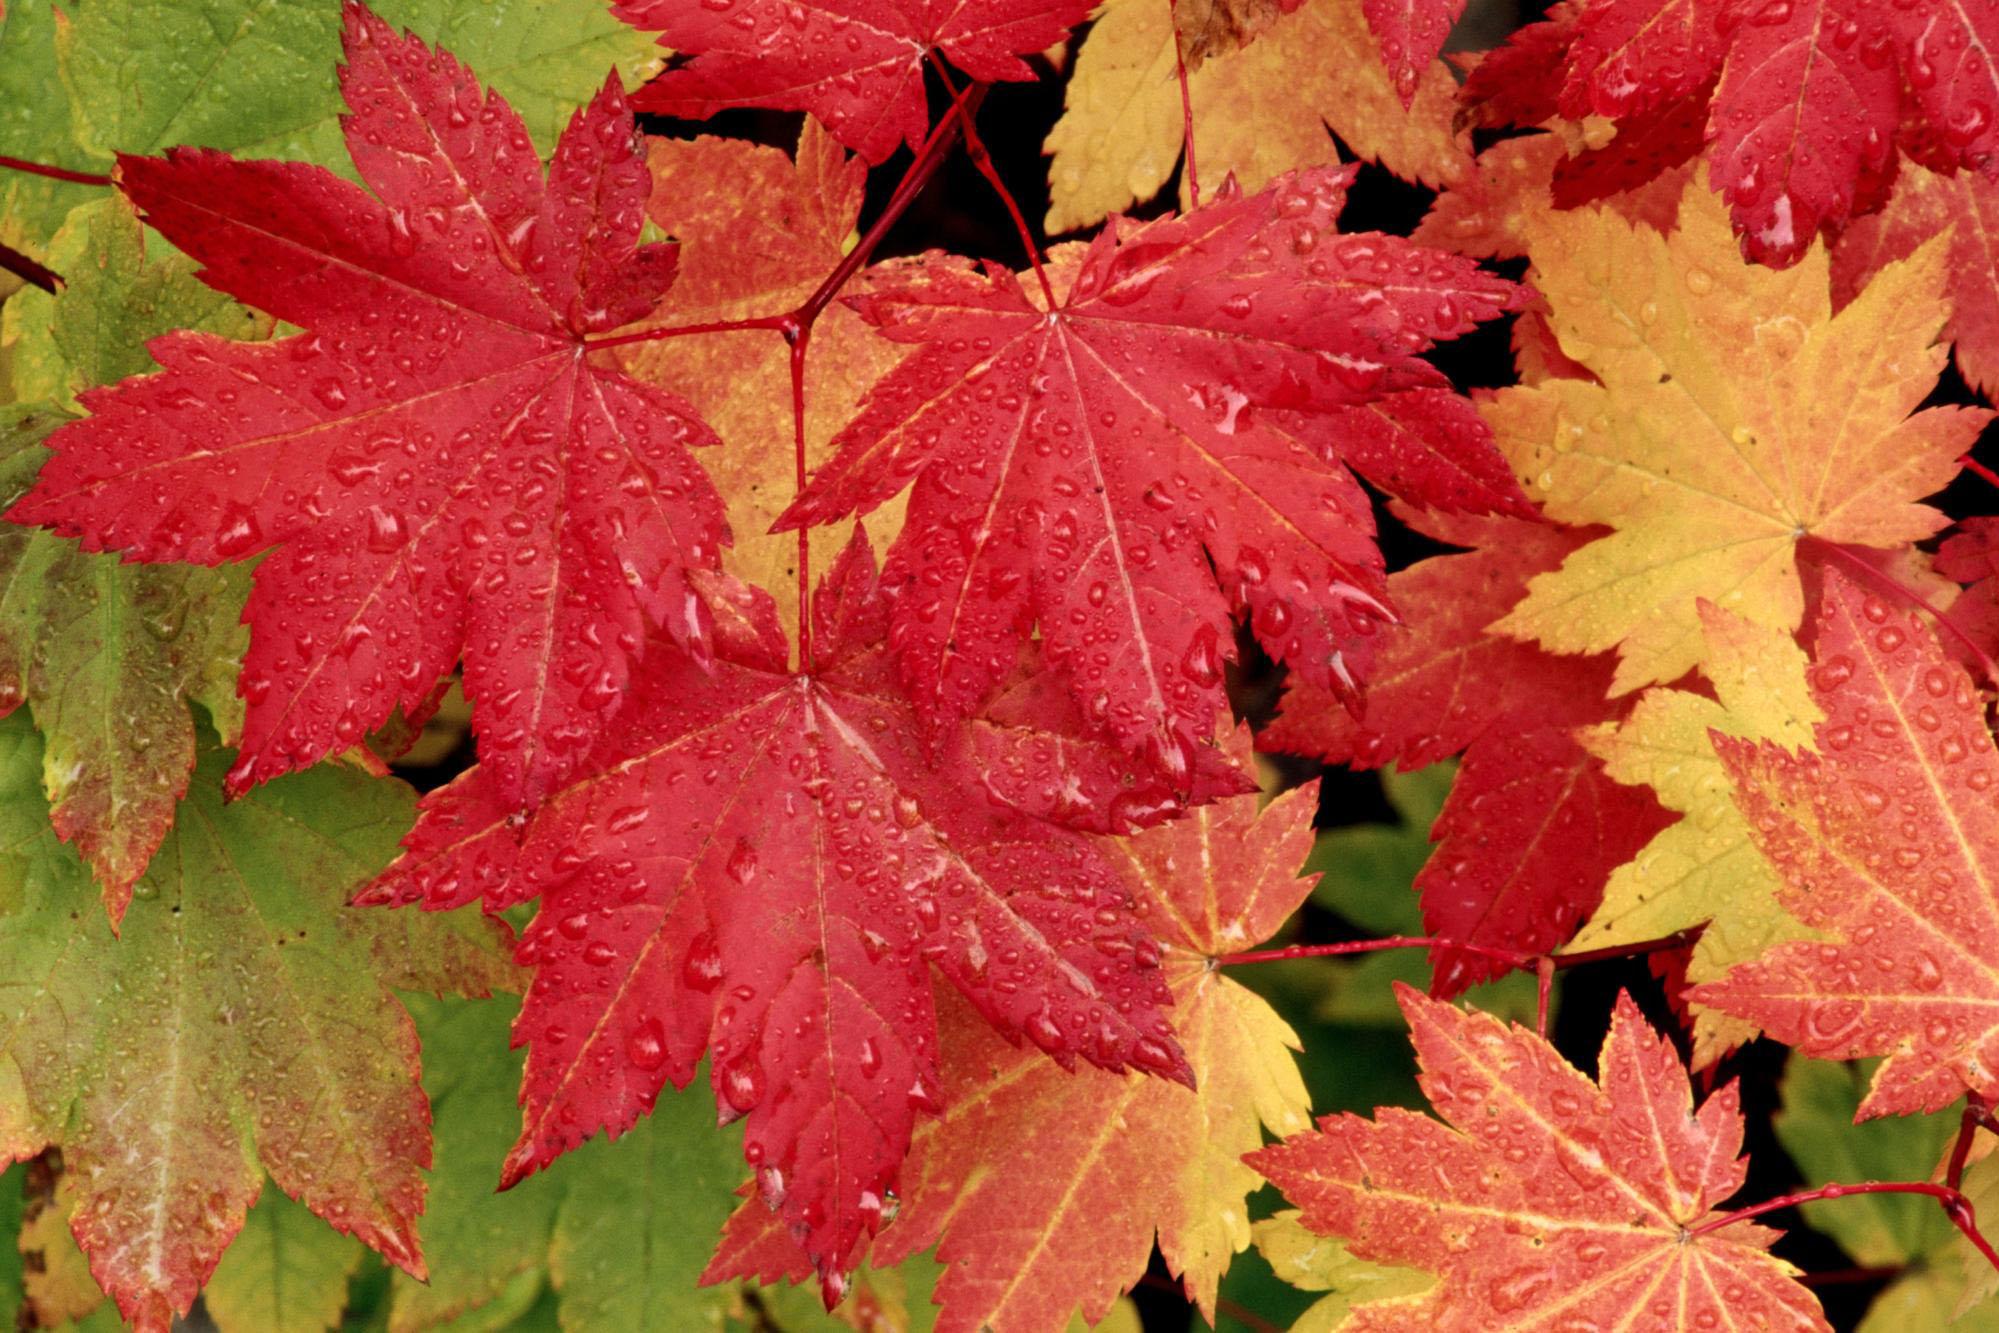 49 Autumn Wallpaper For Mac On Wallpapersafari